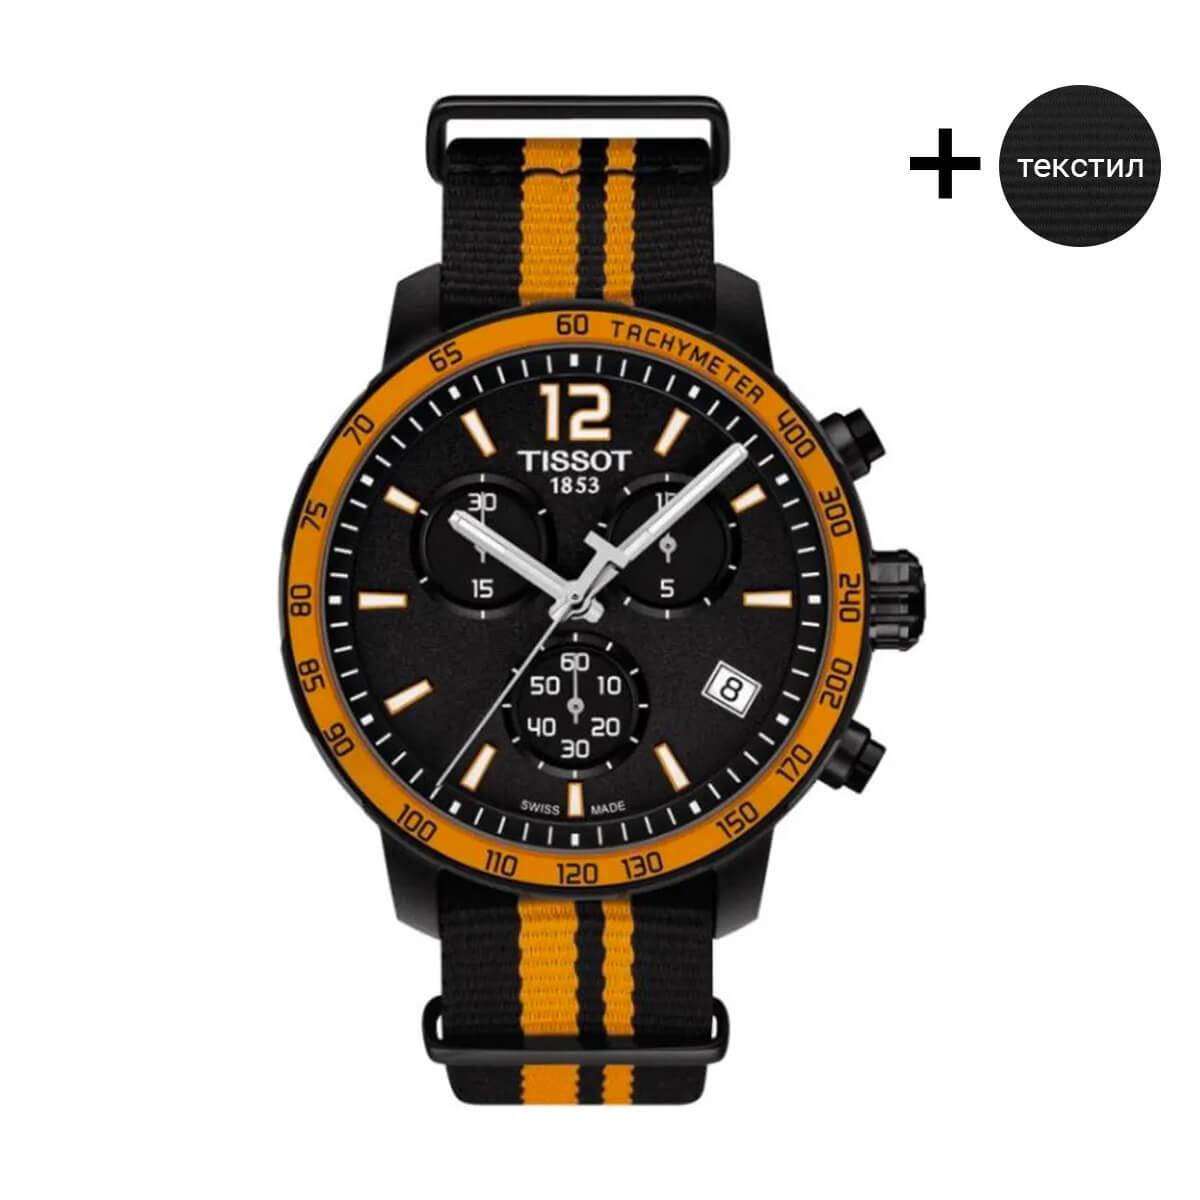 Часовник Tissot T095.417.37.057.00